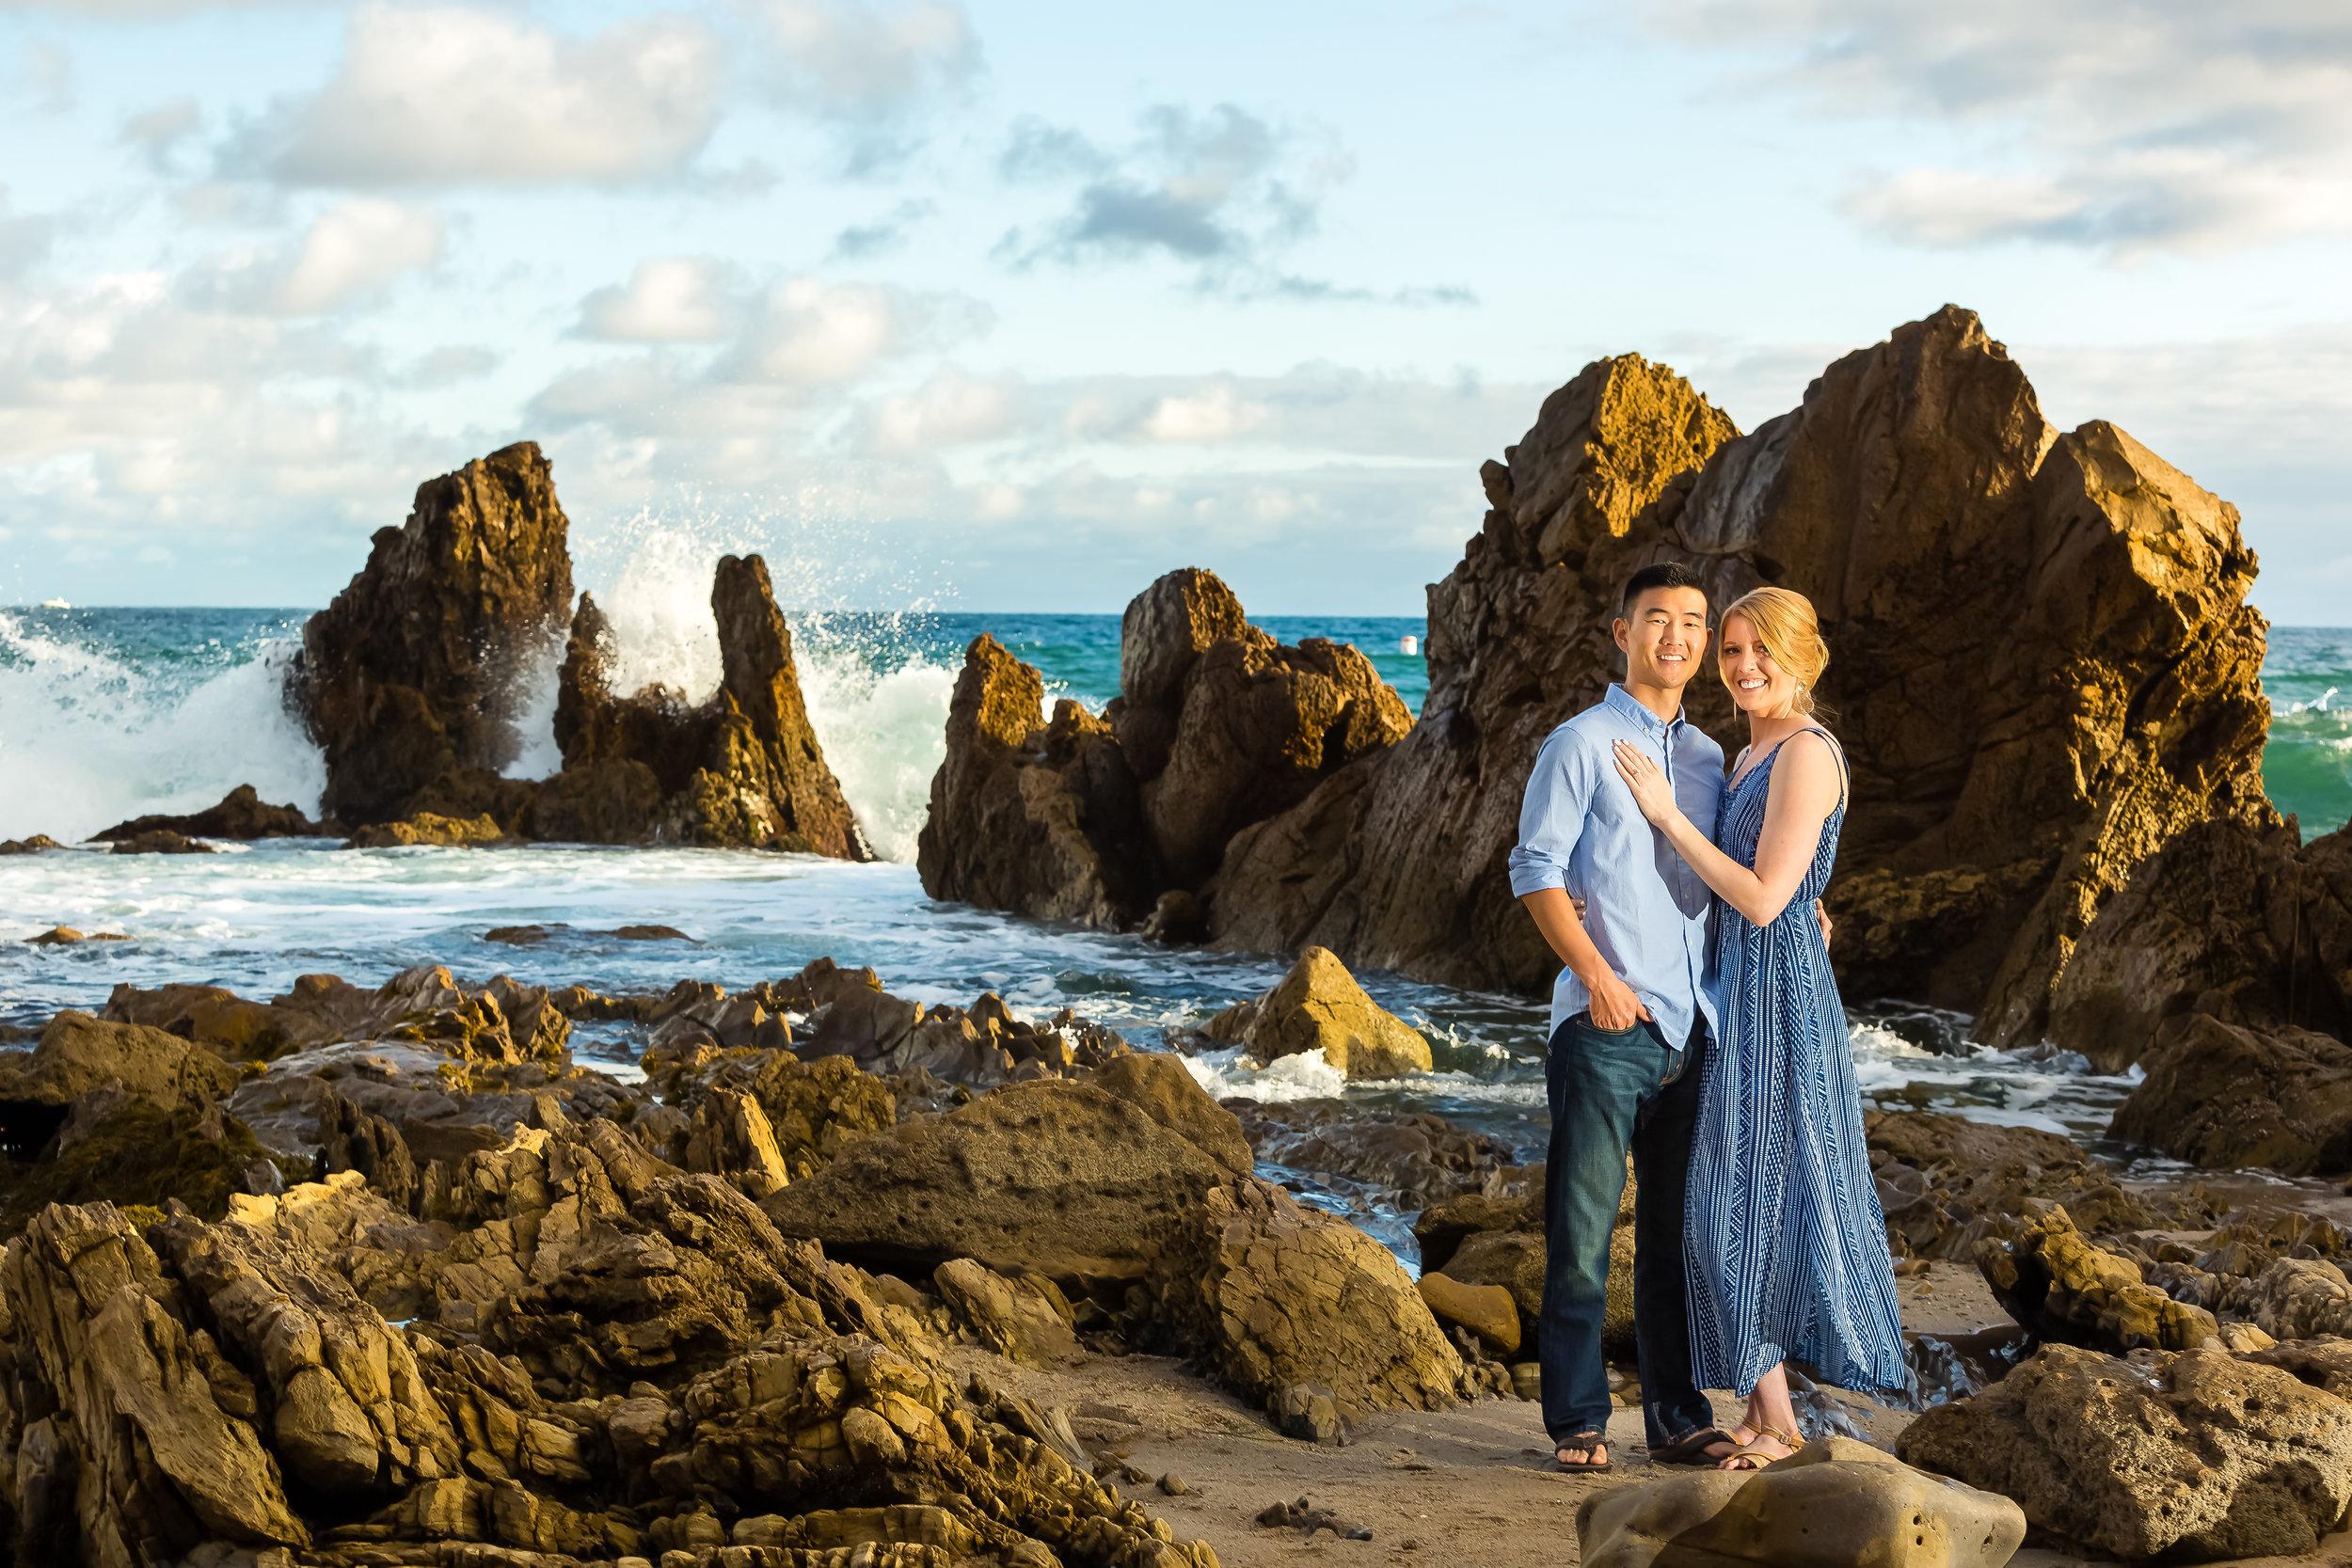 Allie-James-Beach-Engagement-26.jpg